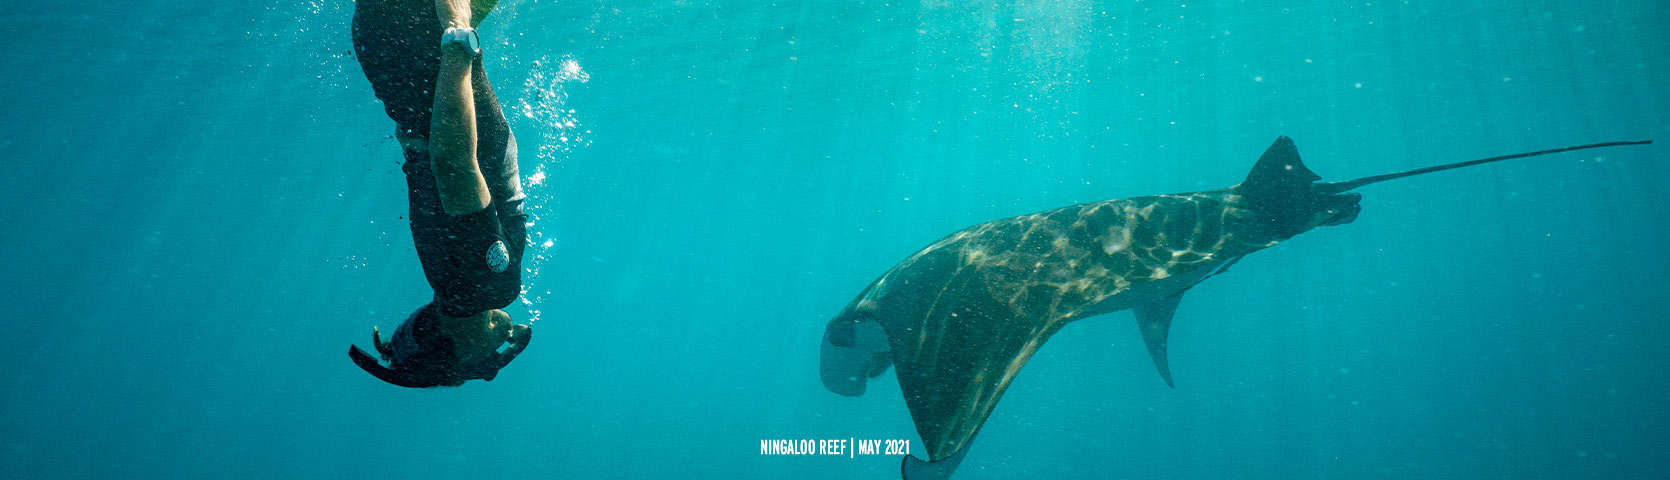 Ningaloo-Reef-Manta-Ray-Snorkel